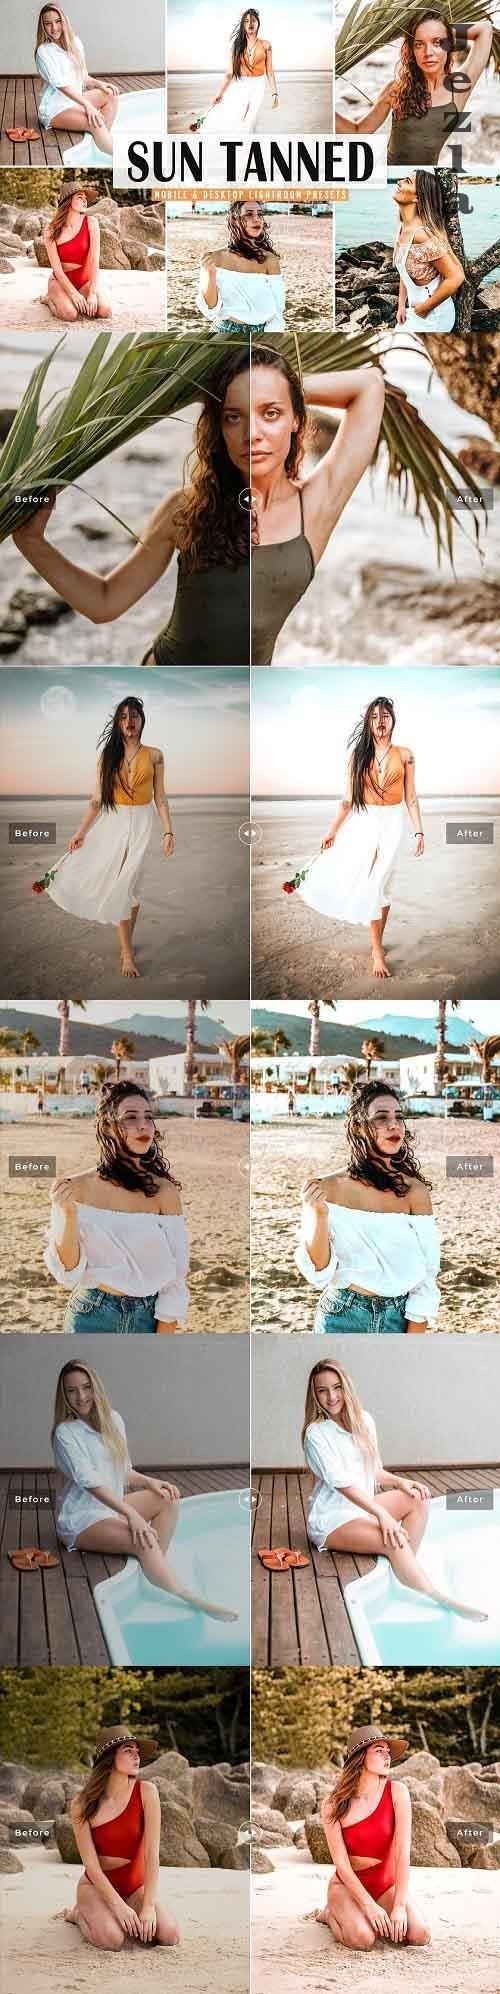 CreativeMarket - Sun Tanned Pro LRM Presets - 5498516 - Mobile & Desktop